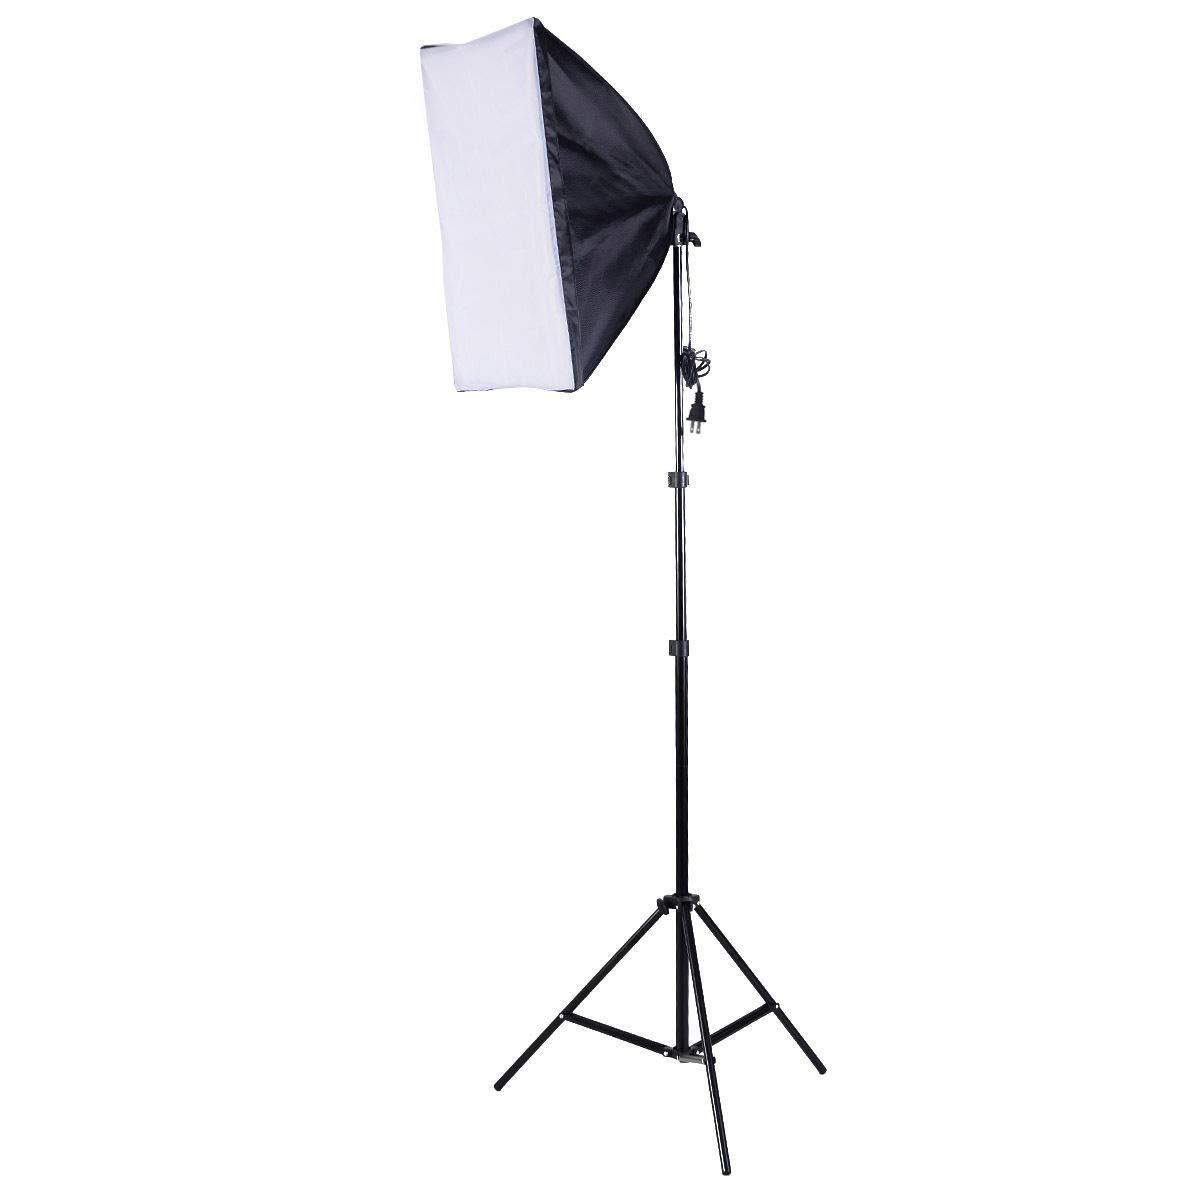 MD Group 2 PCS Lighting Softbox Stand Photography Equipment Light Kit